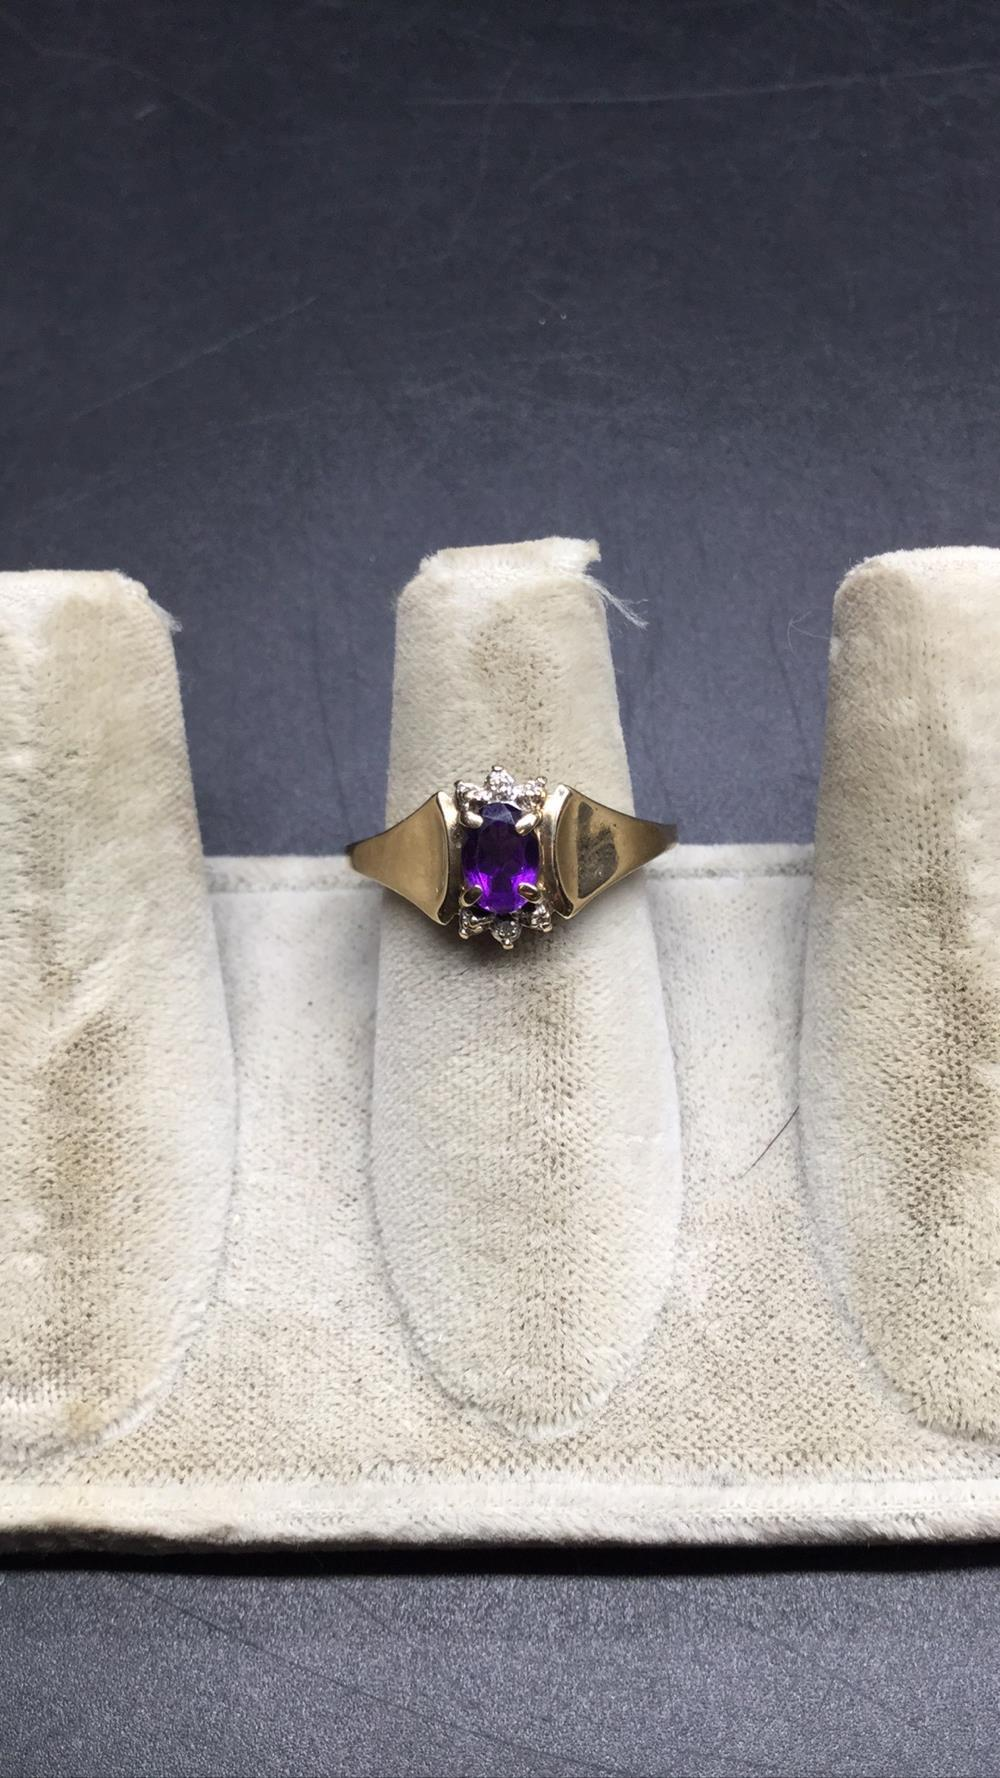 10k diamond and amethyst ring